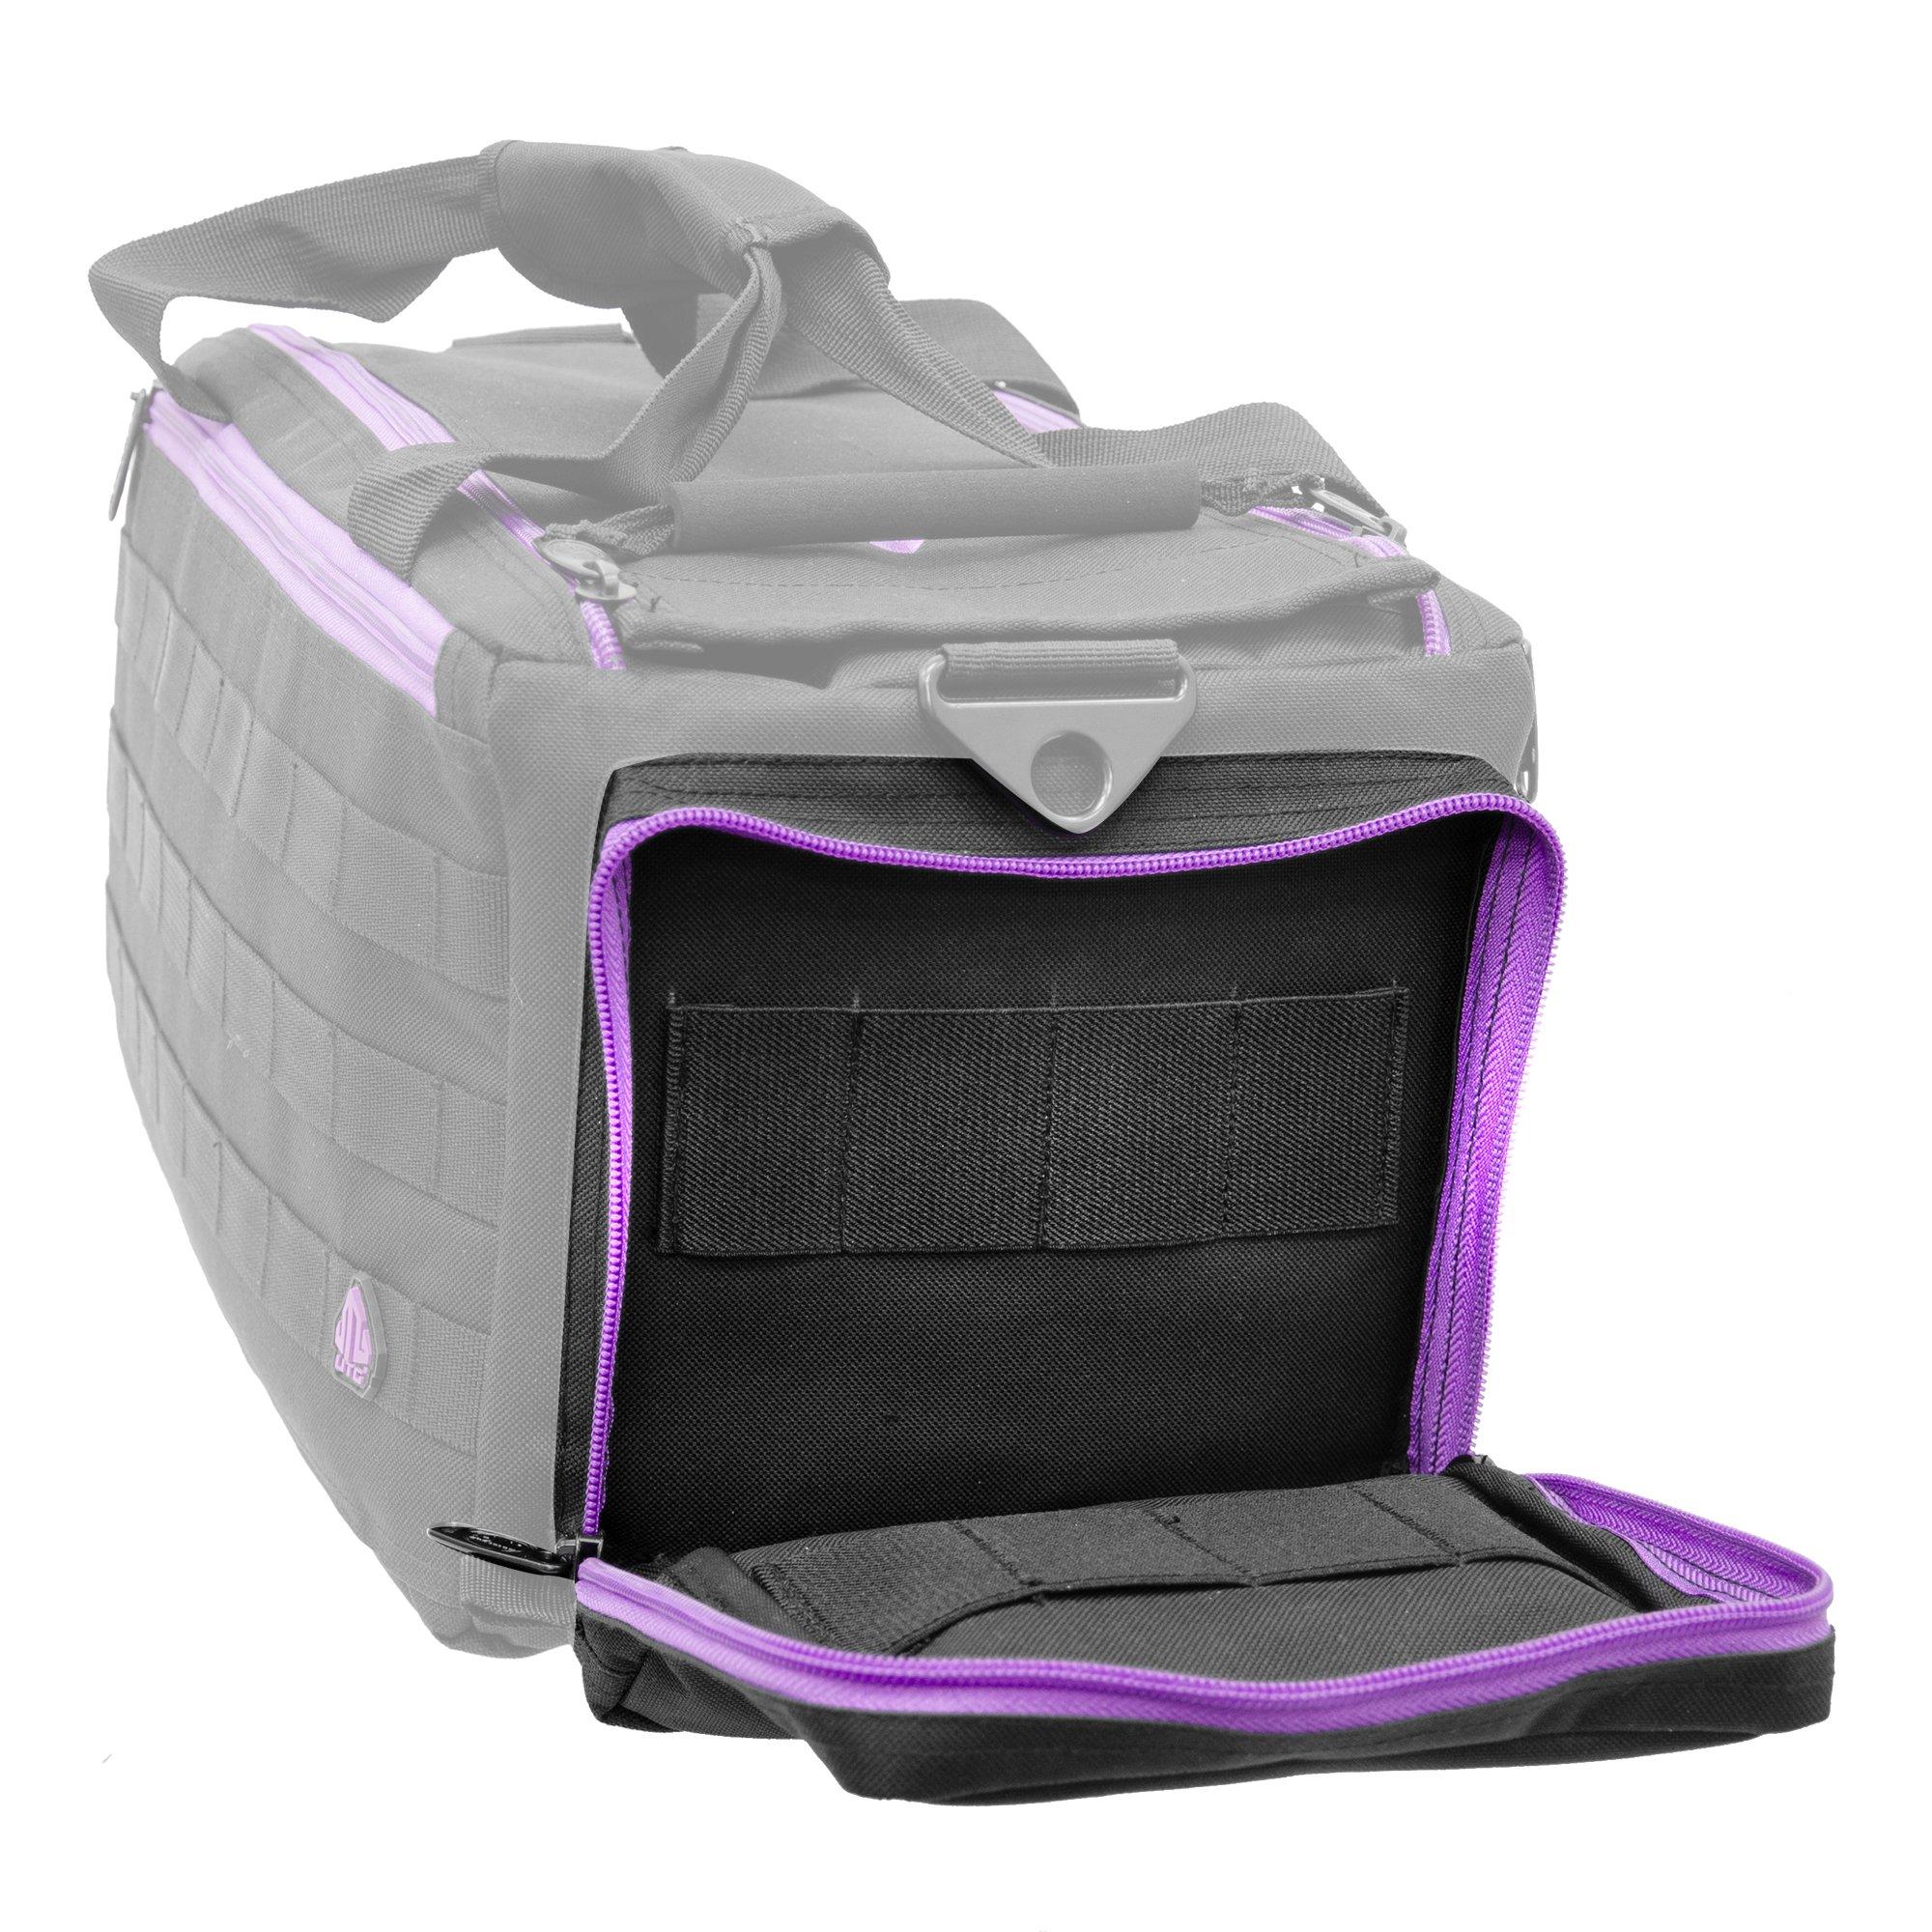 UTG All in One Range/Utility Go Bag, Black/Violet, 21'' x 10'' x 9'' by UTG (Image #9)